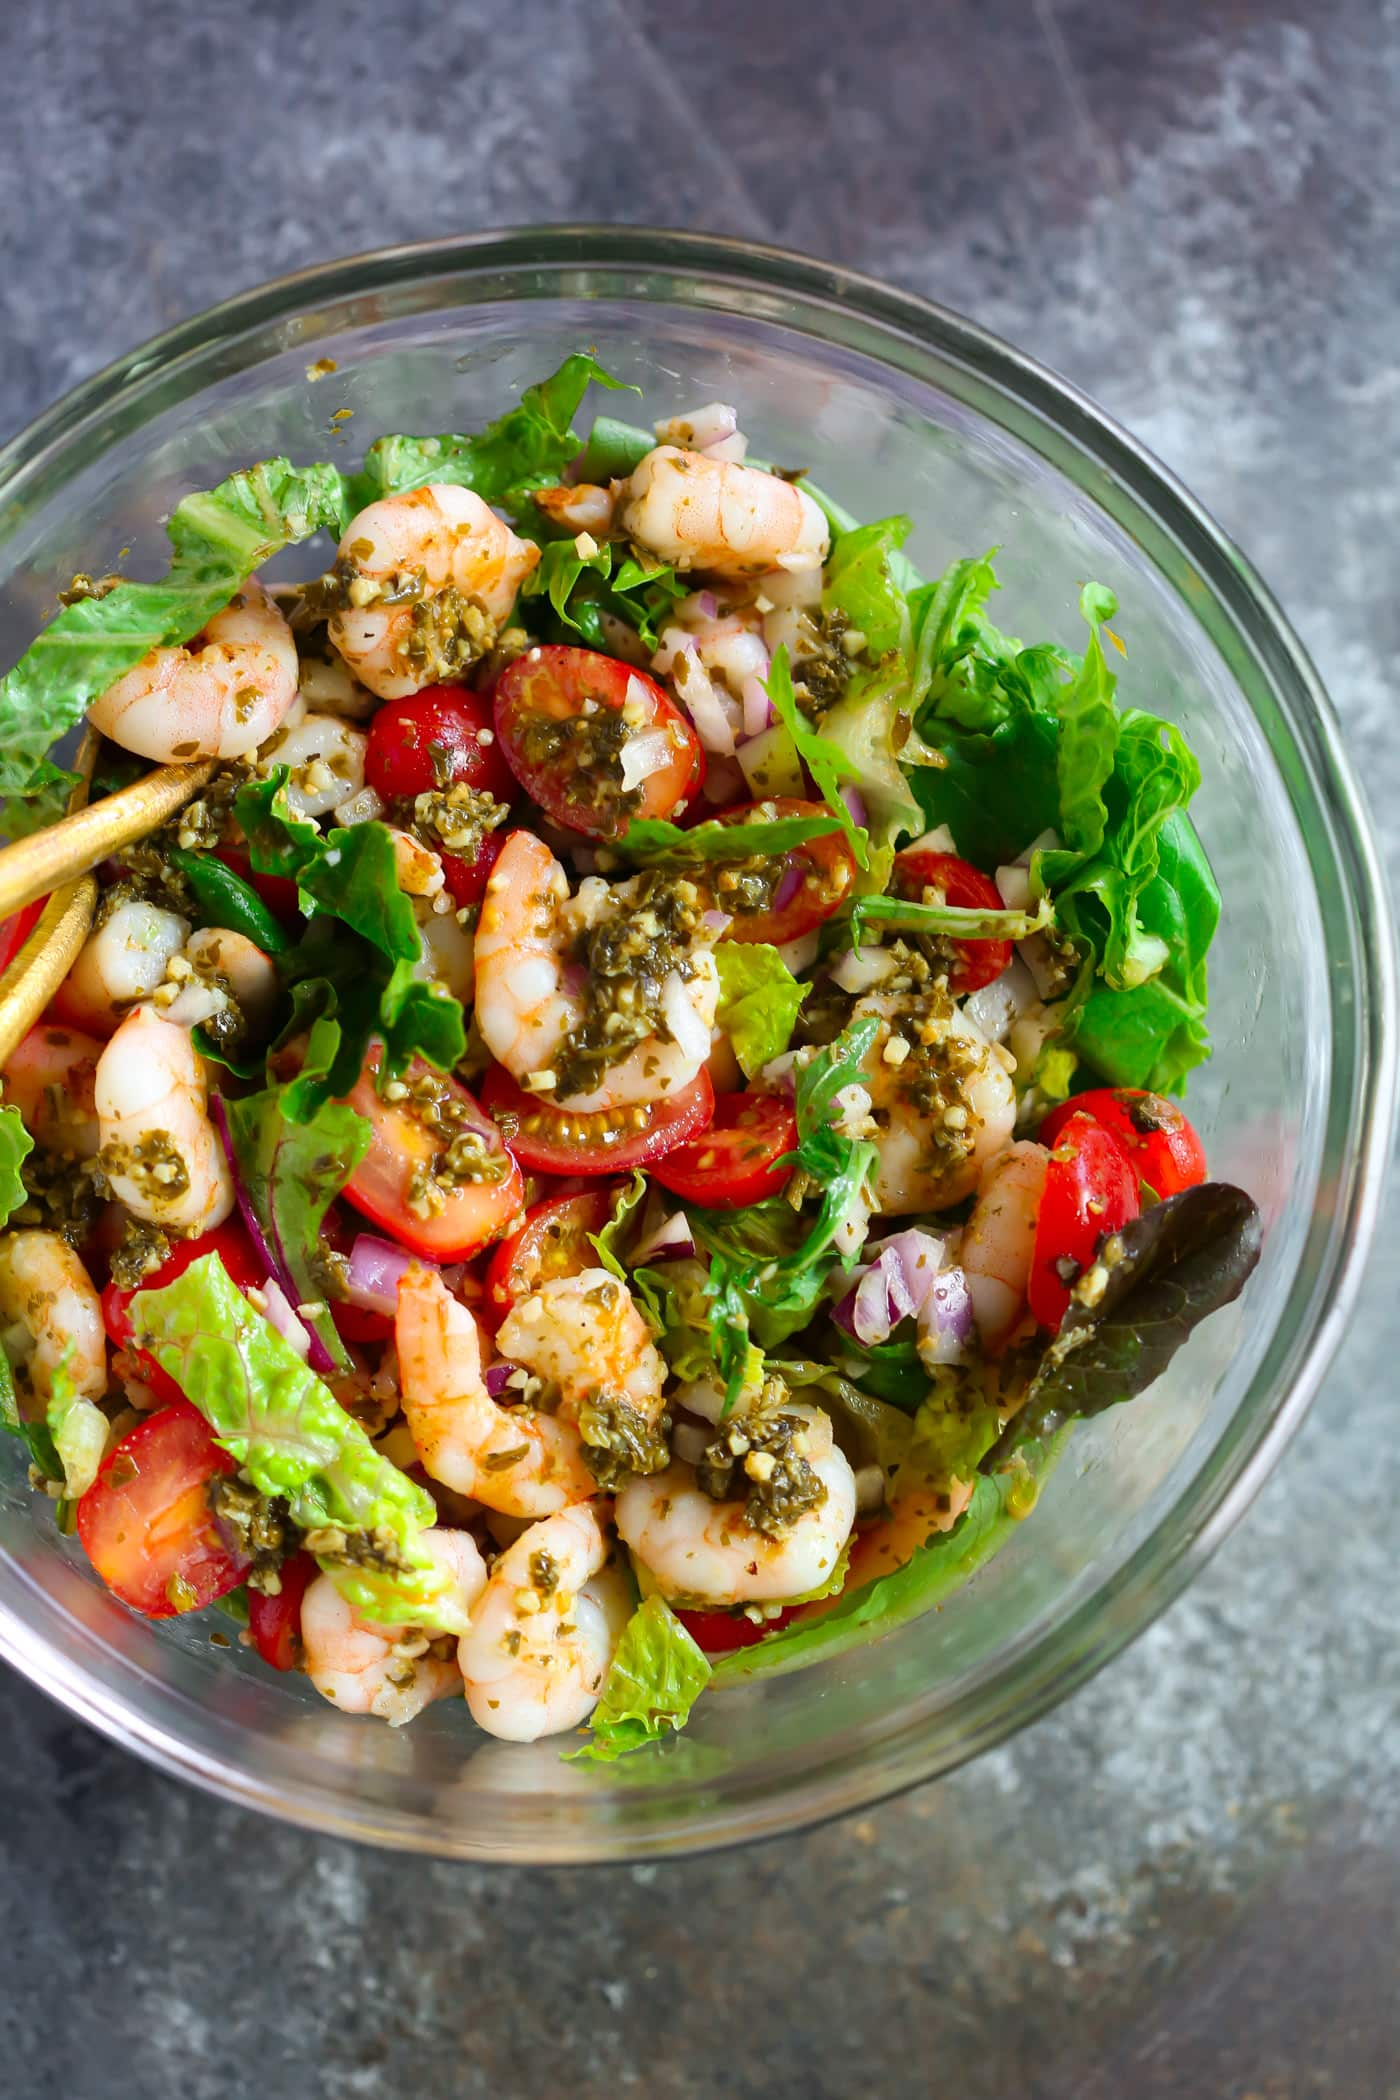 Glass bowl containing pesto shrimp tomato salad.